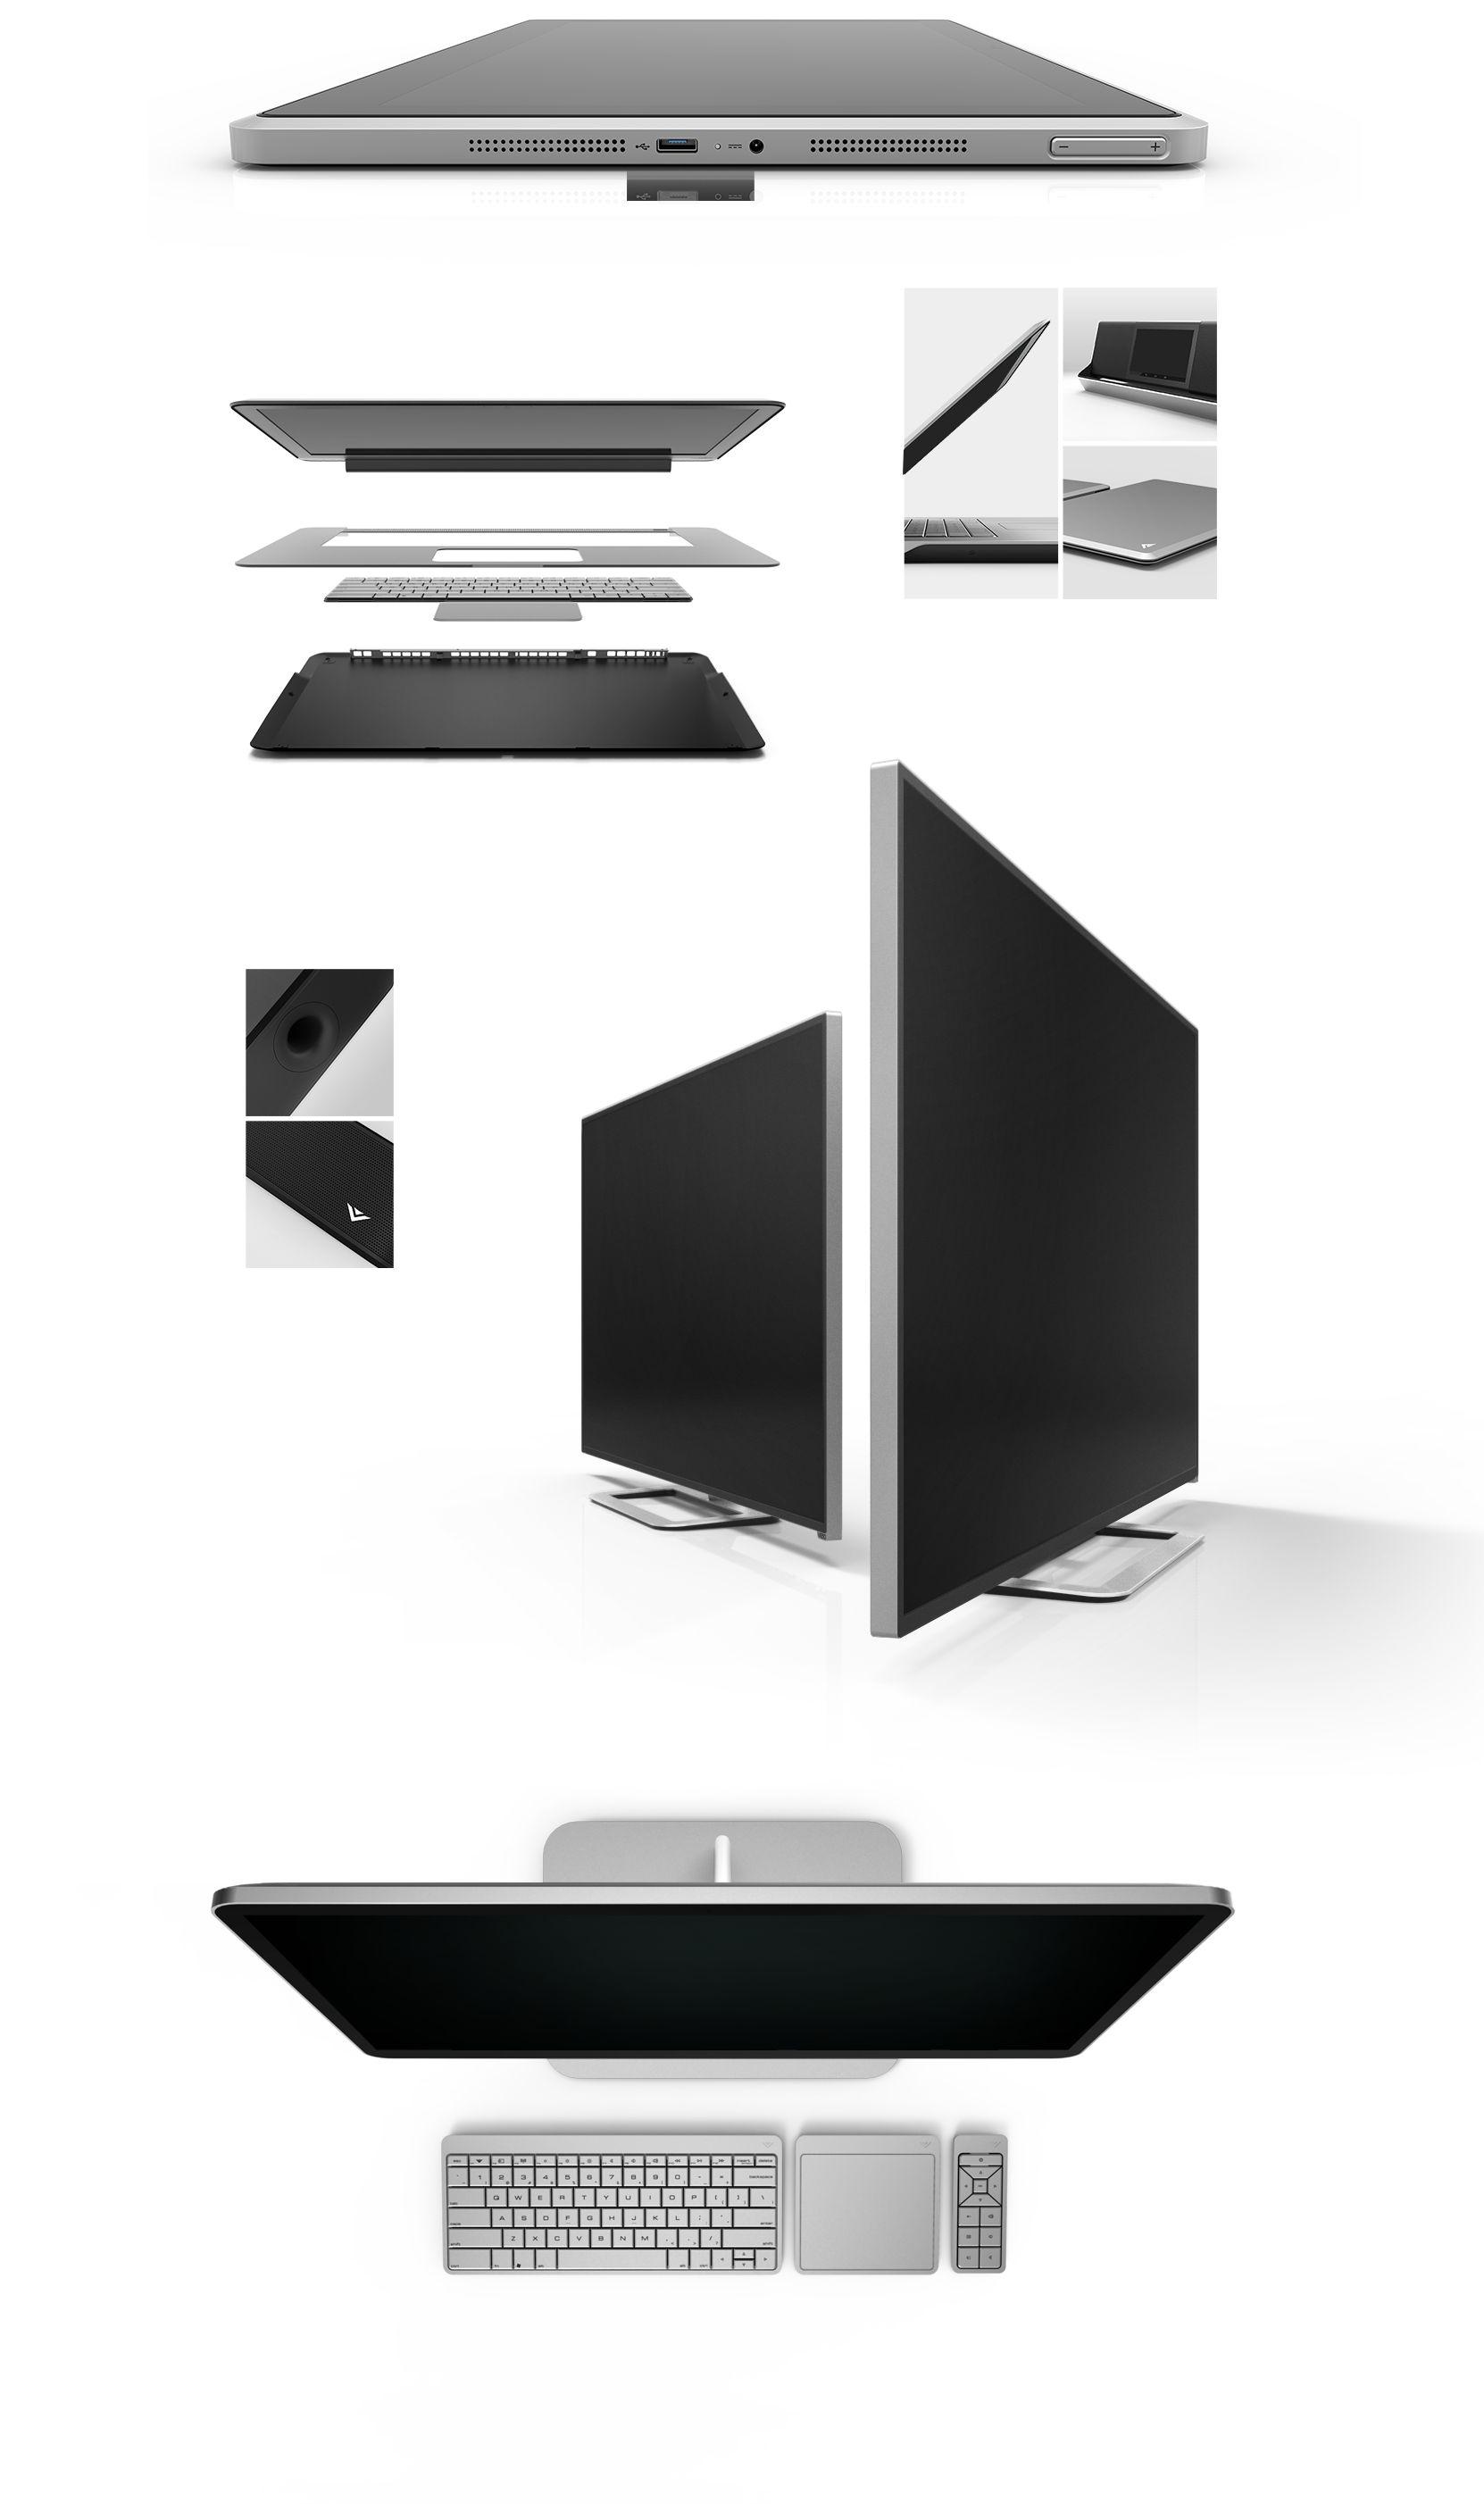 VIZIO Product CGI